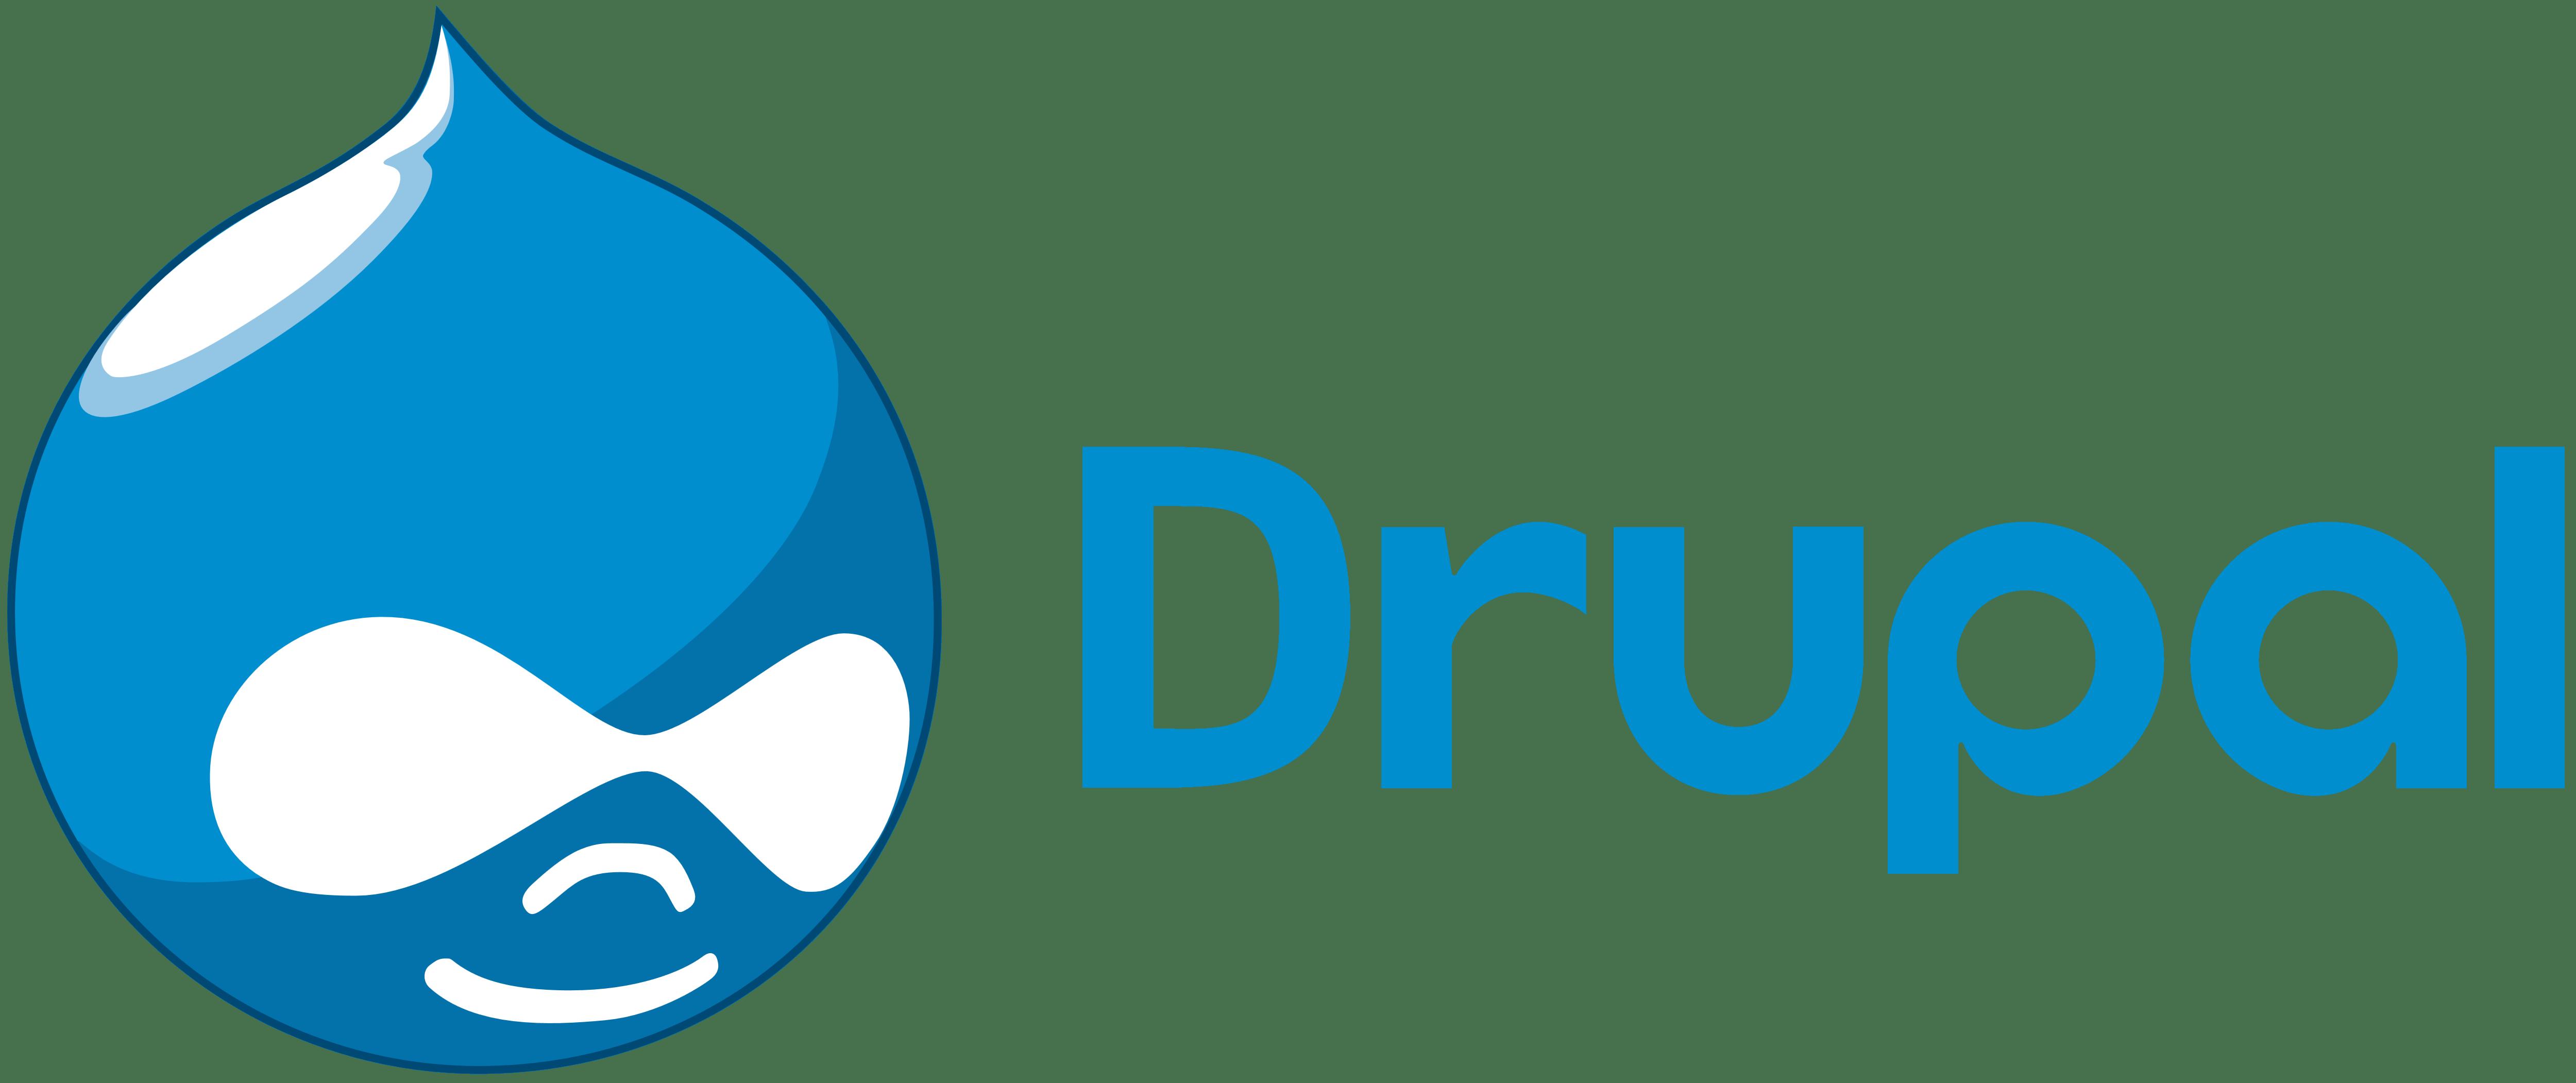 Drupal Transparent PNG SVG Clip arts